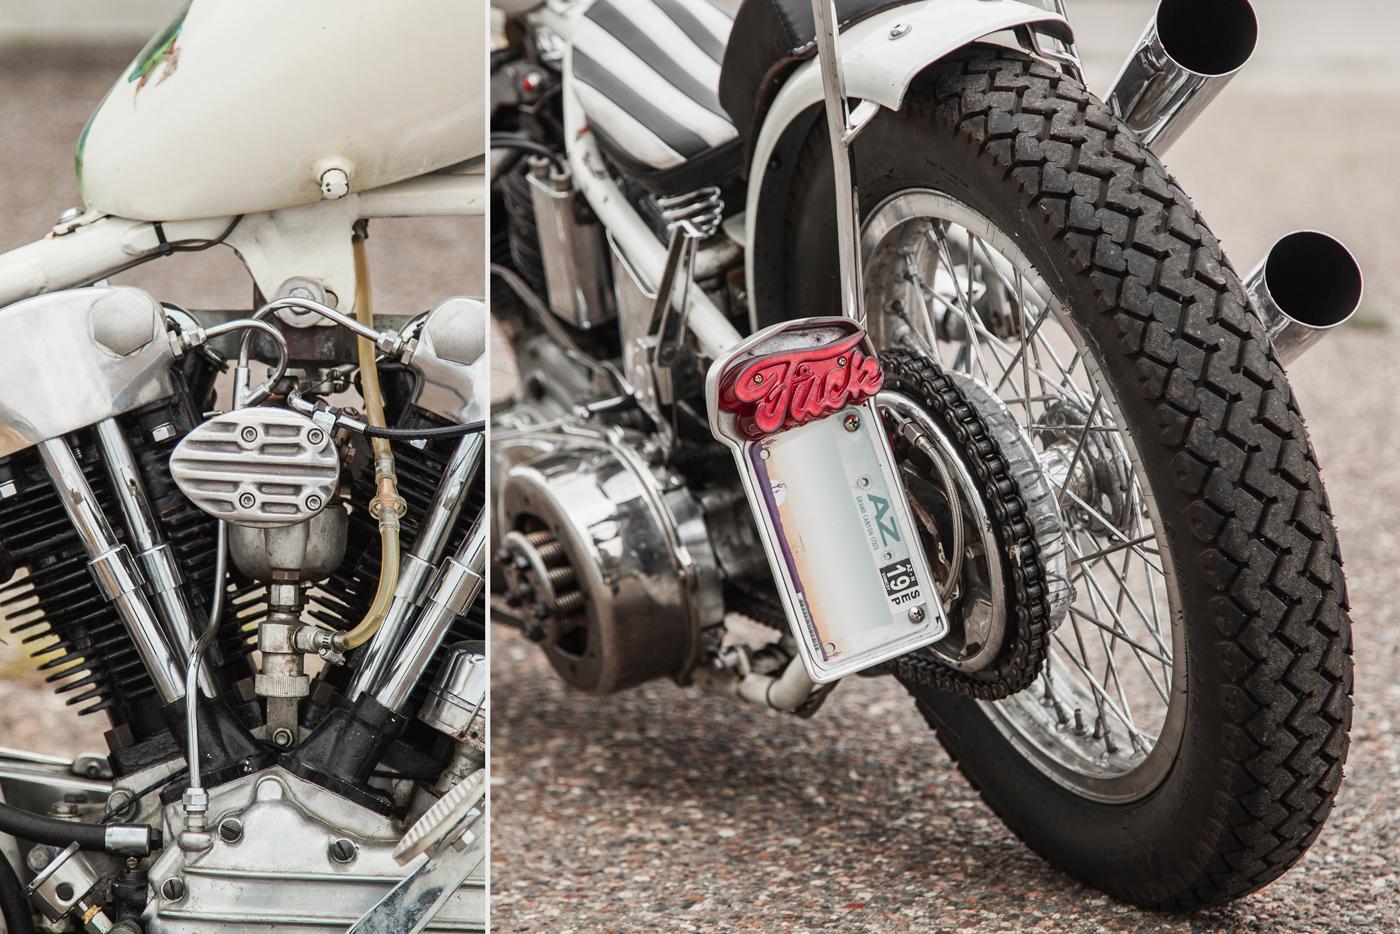 throttle_bike_crop.jpg